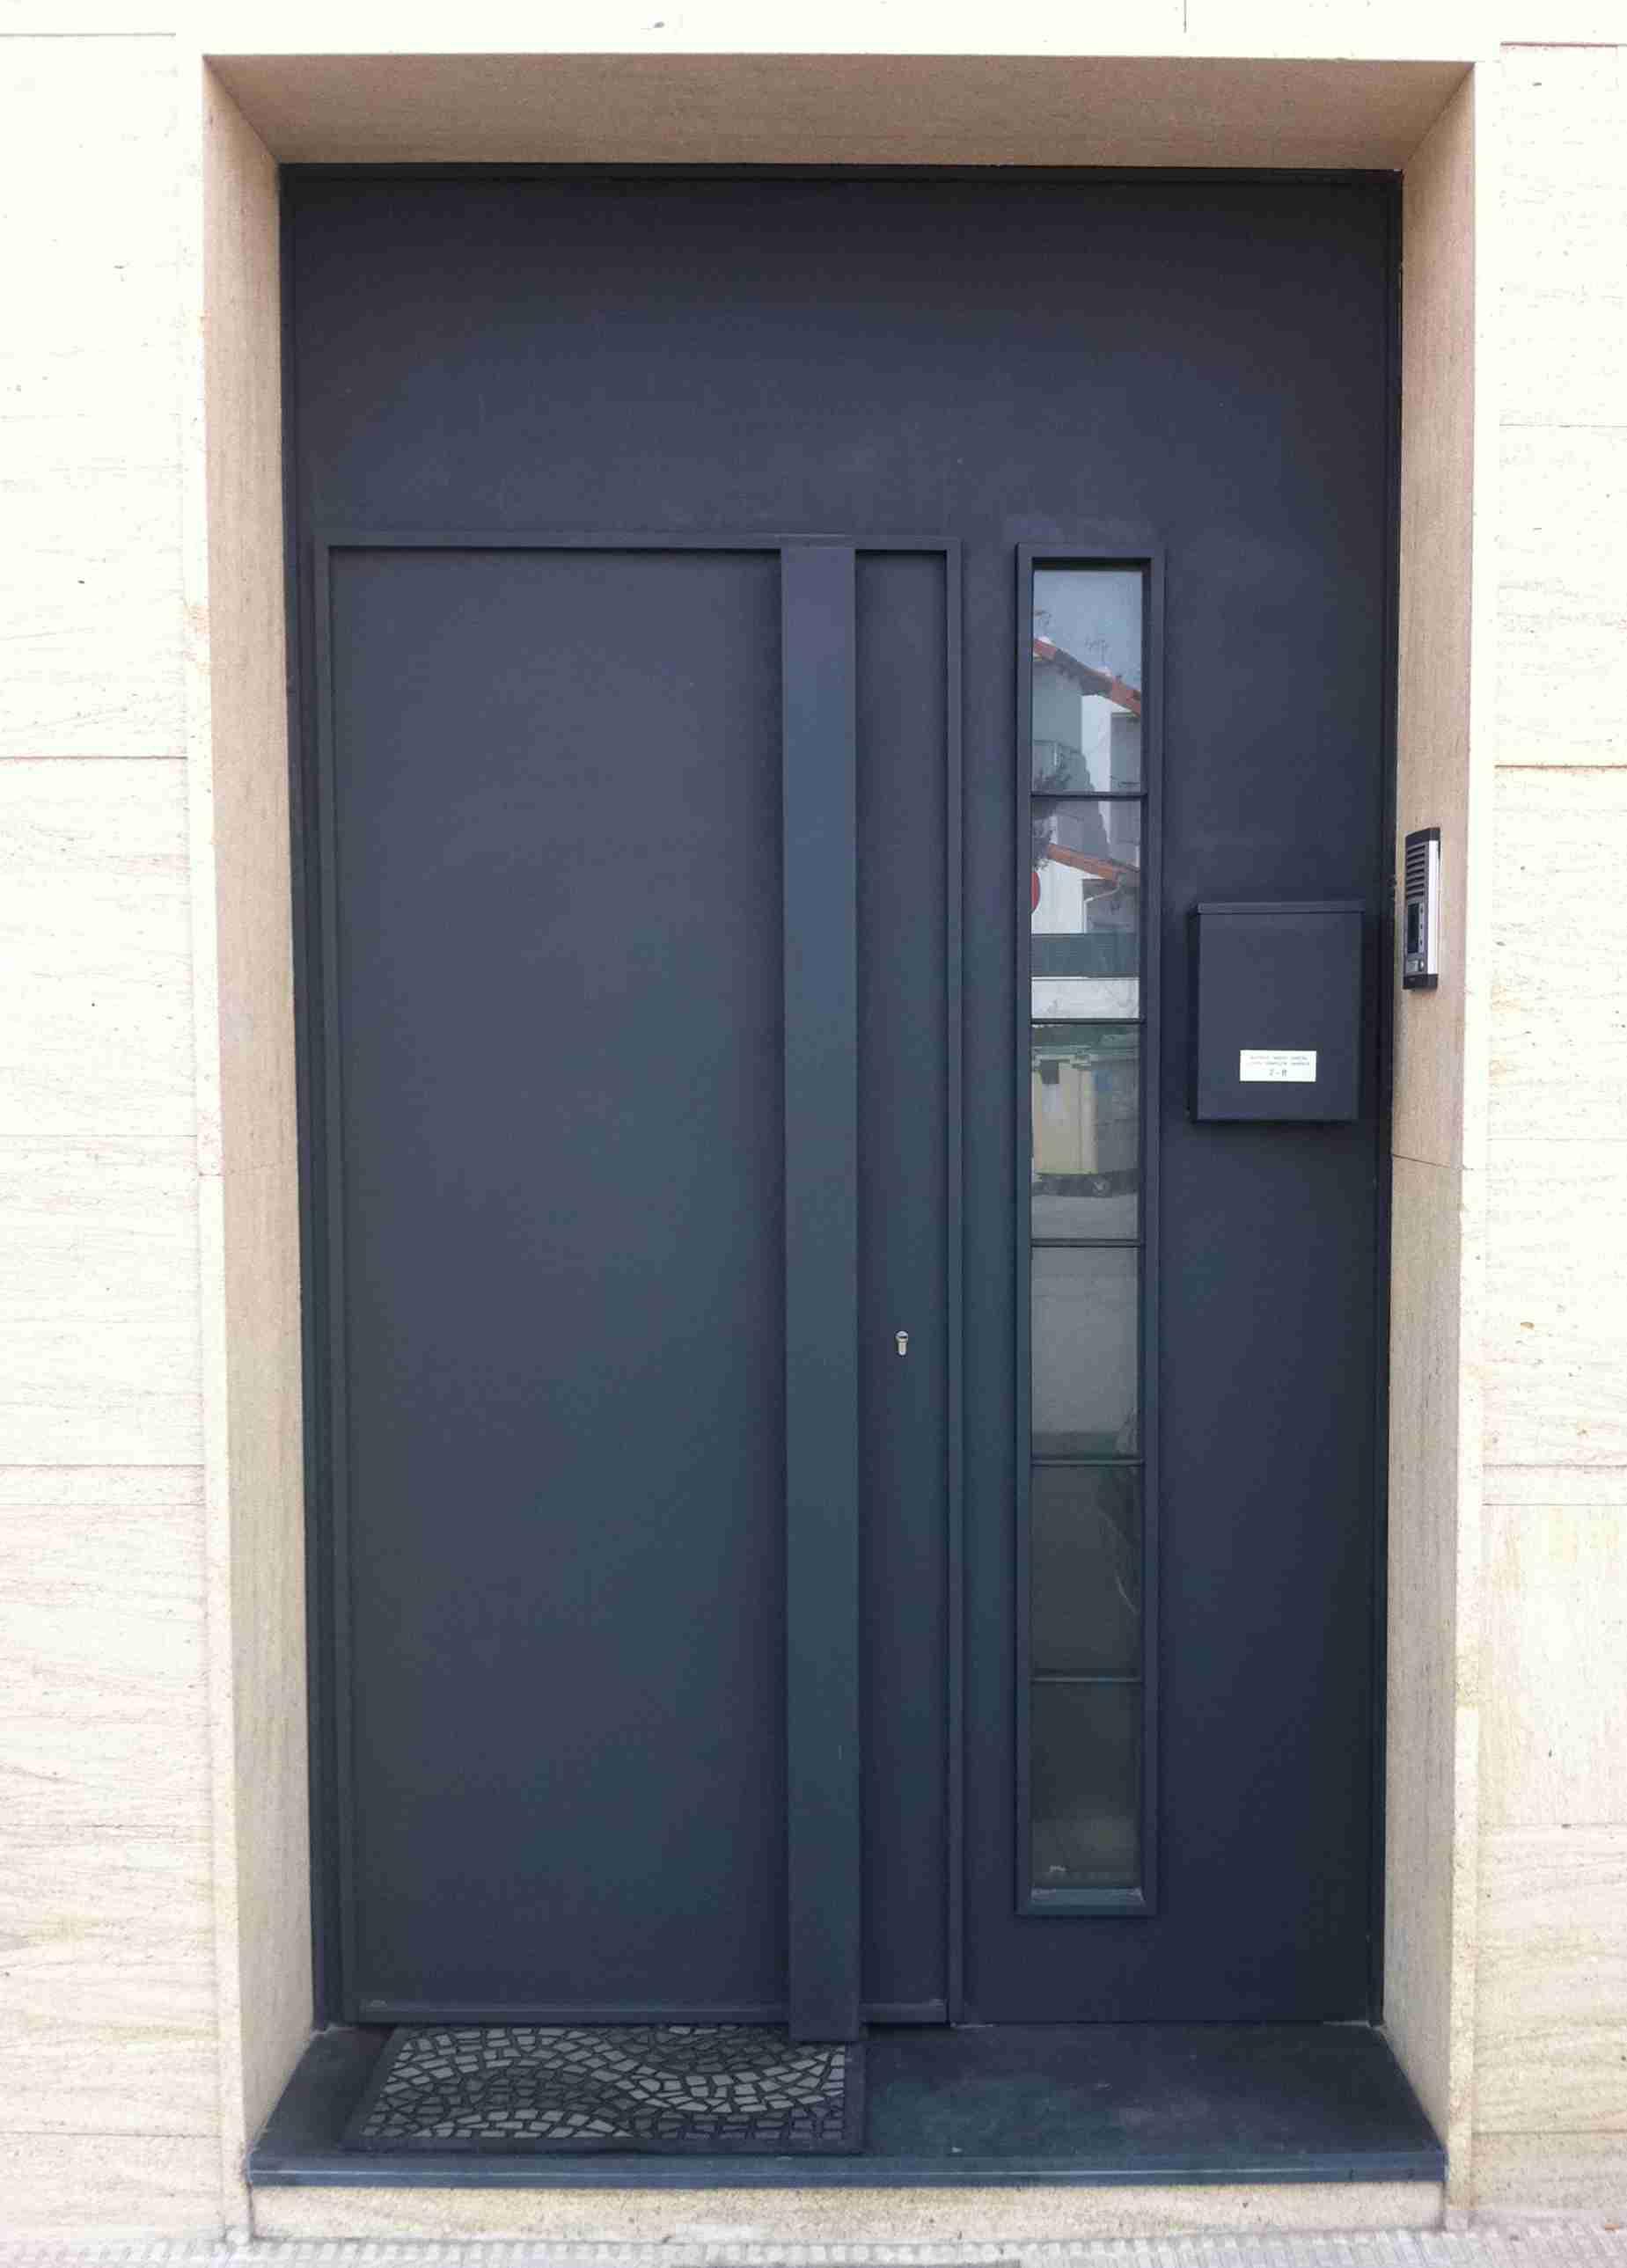 Puertas modernas puerta de entrada con estilo moderno y for Modelos de puertas para casas modernas